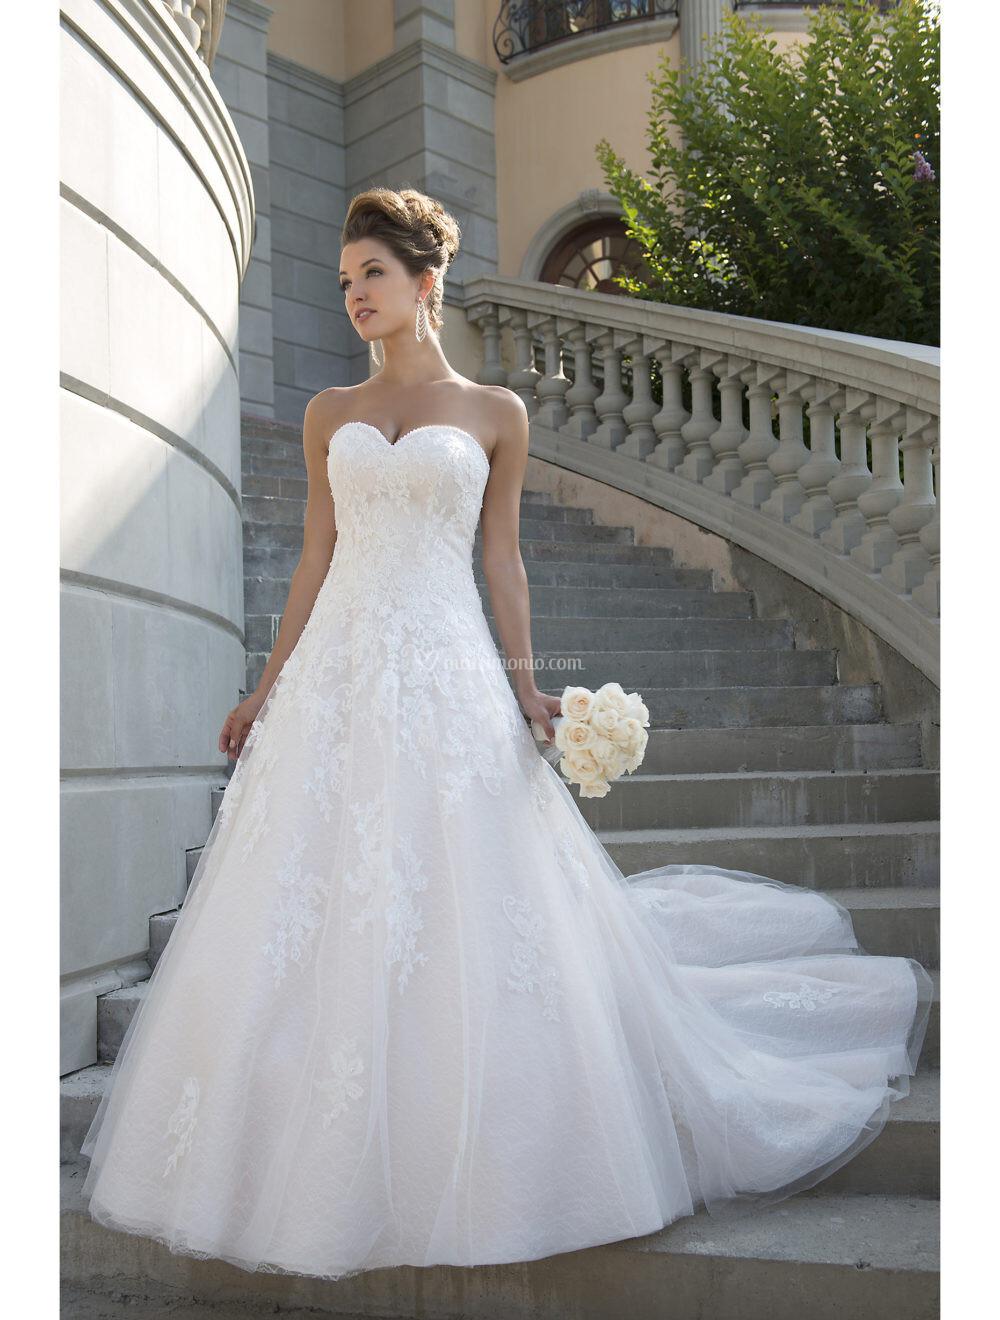 Abiti da Sposa di Venus Bridal - Matrimonio.com 6baa8d3d6aa